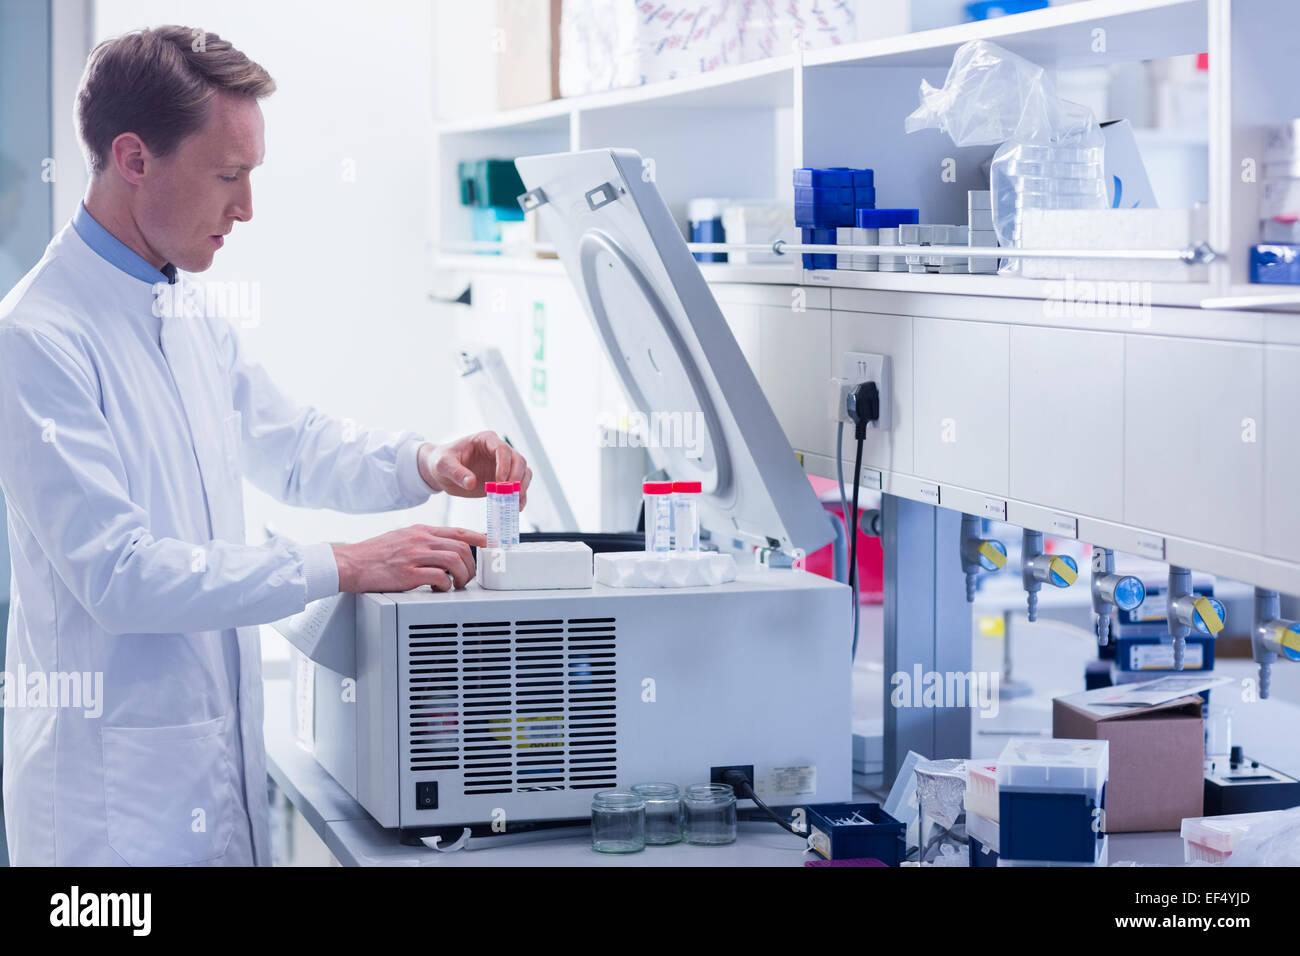 Fokussierte Chemiker machen ein Experiment Stockbild